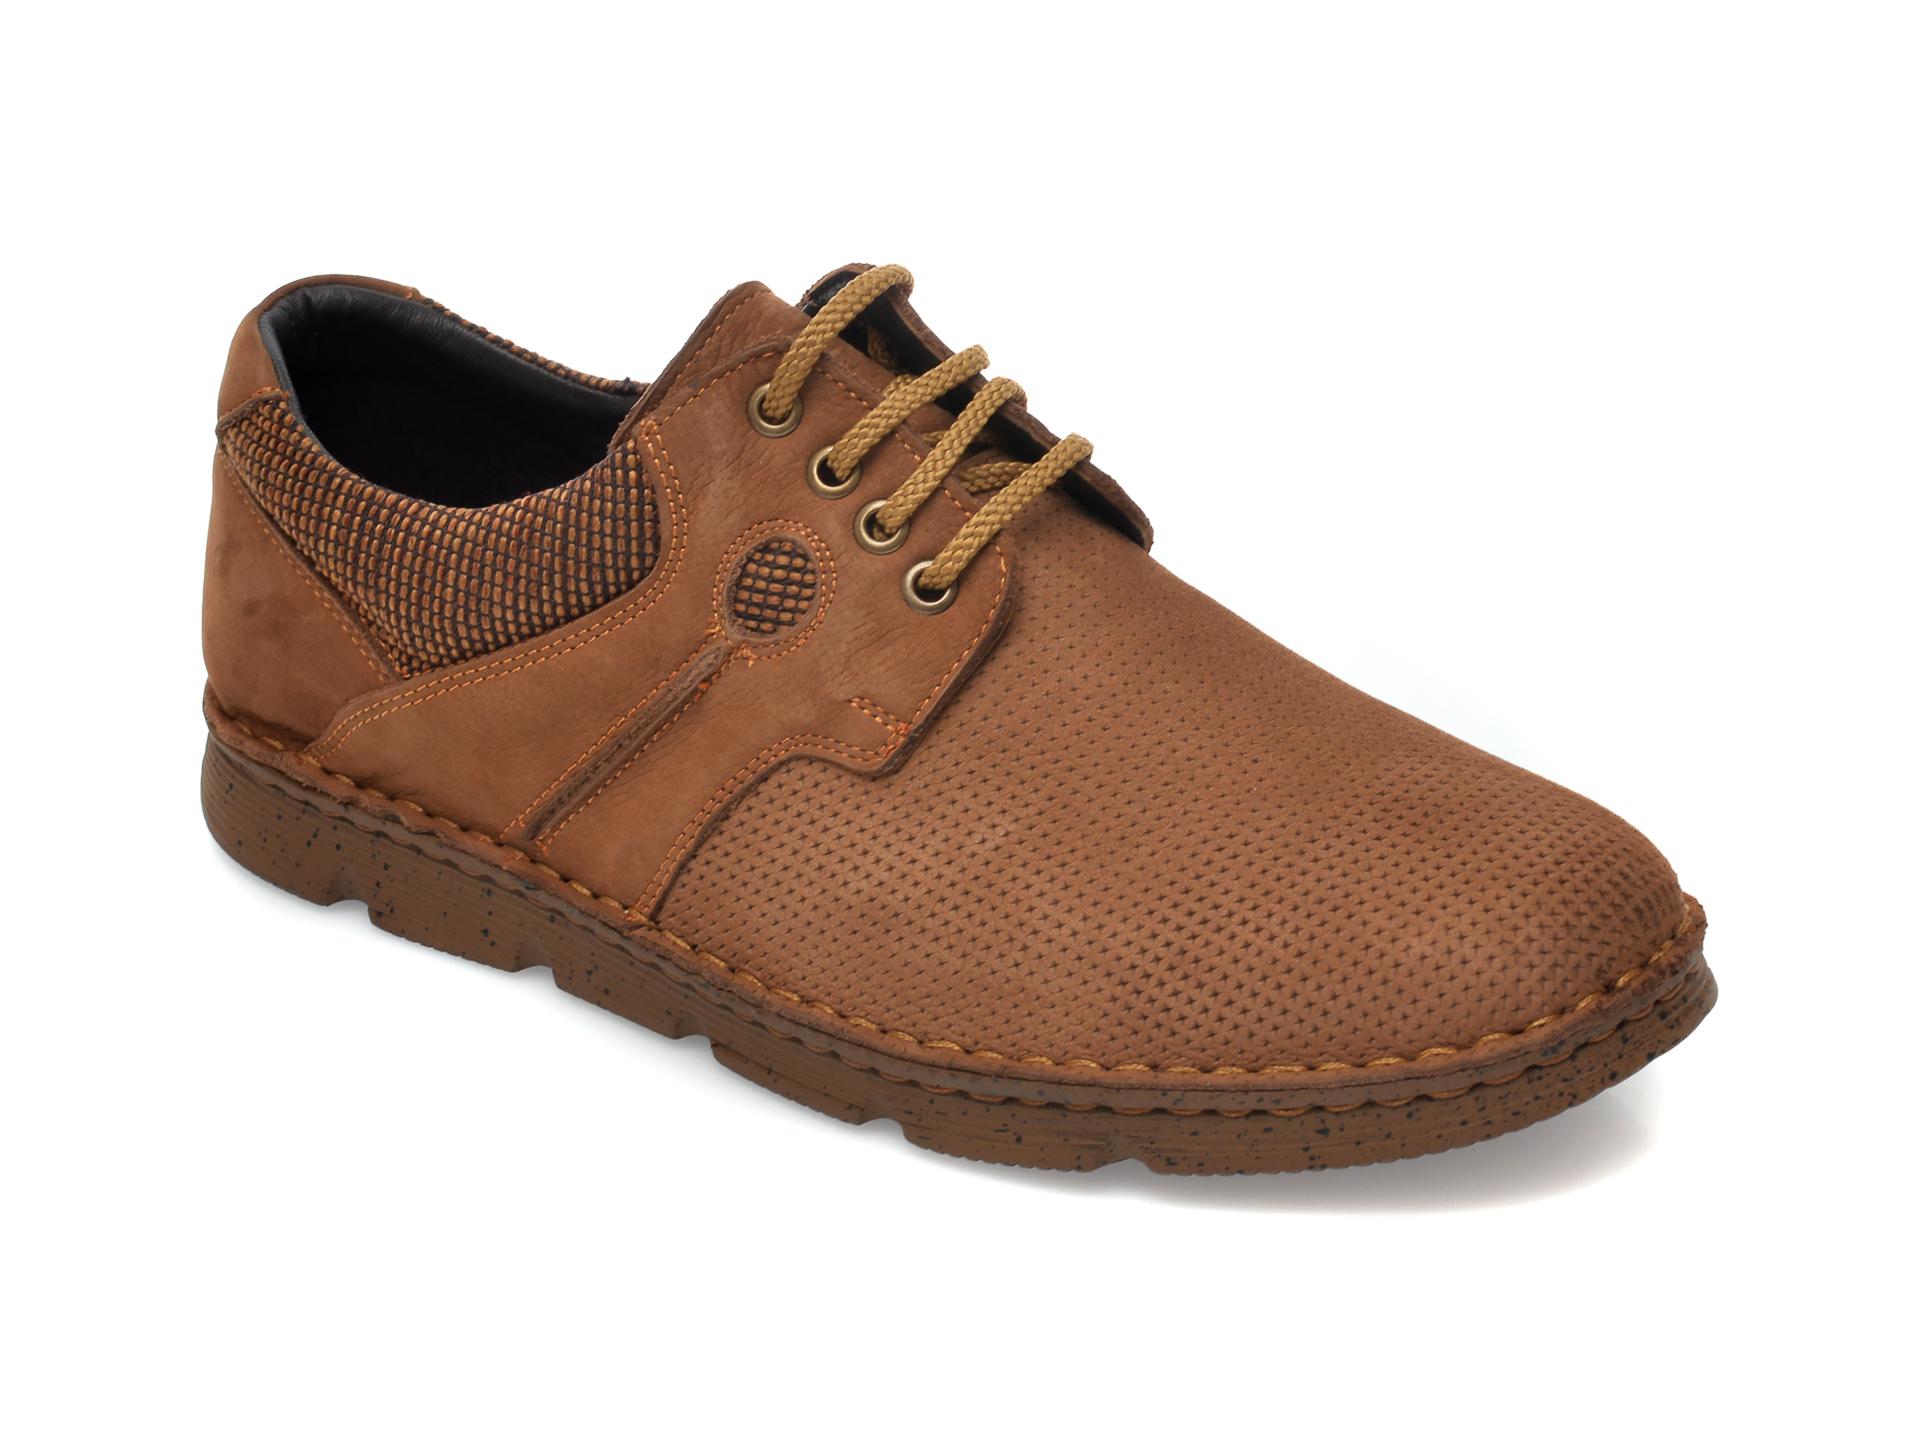 Pantofi OTTER maro, 2827, din nabuc imagine